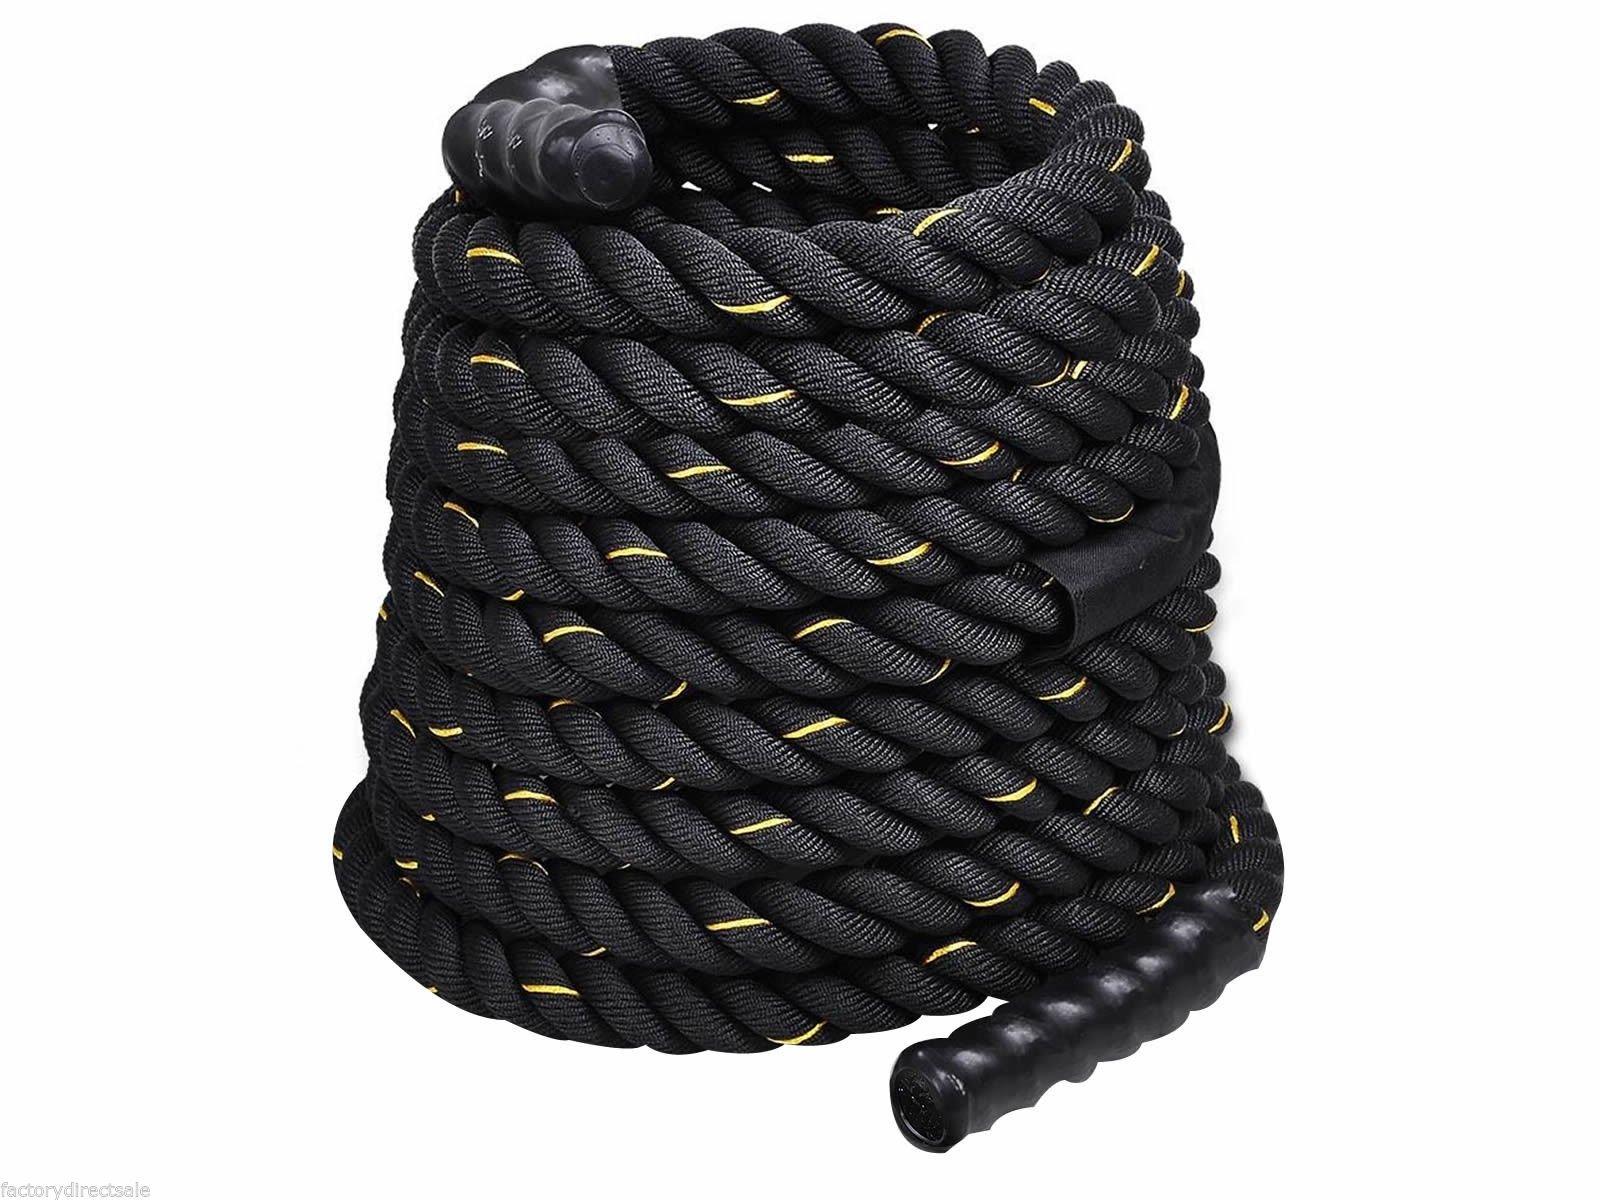 Giantex 1.5'' Workout Strength Training Undulation Poly Dacron Battle Rope Black (30ft)